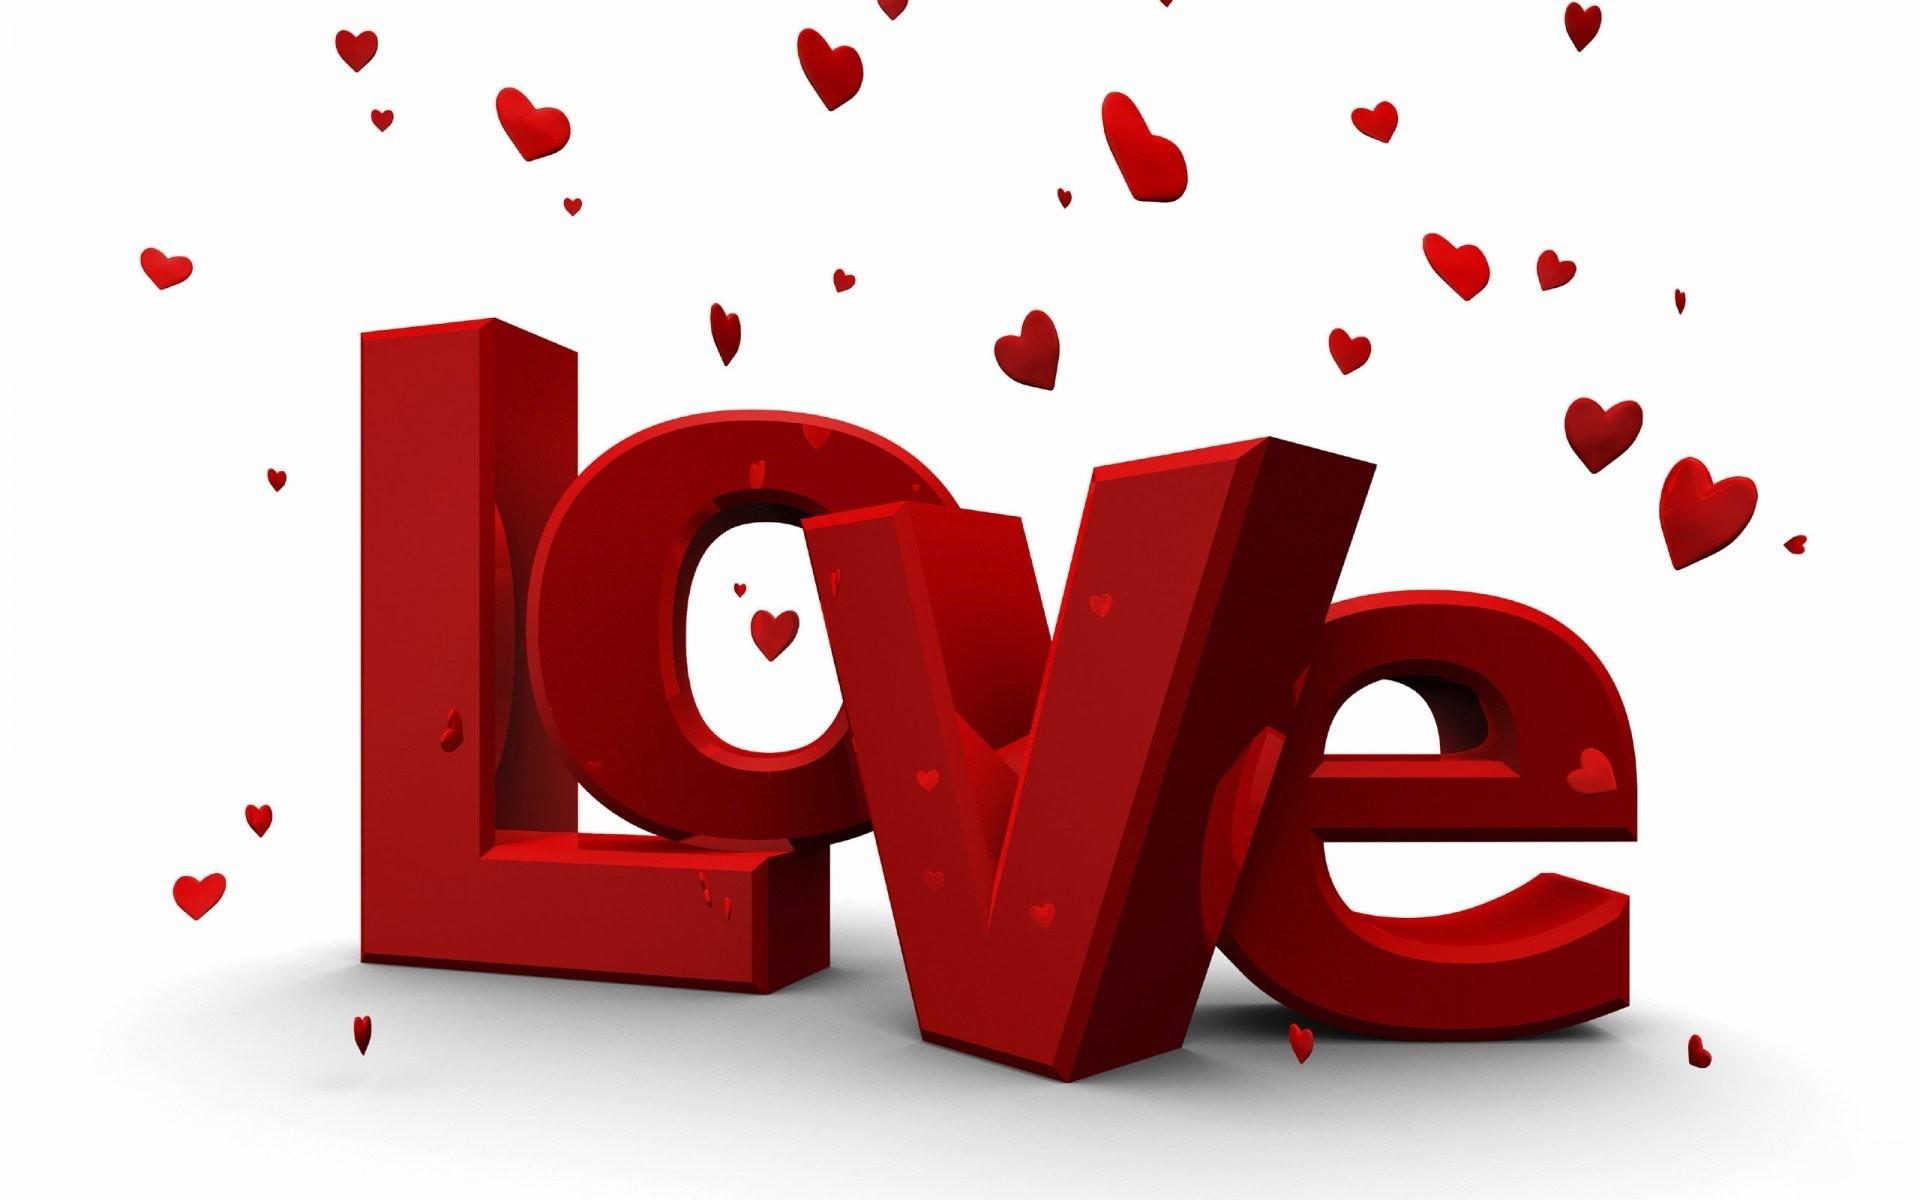 14 february valentine's day valentine's day love inscription word heart love